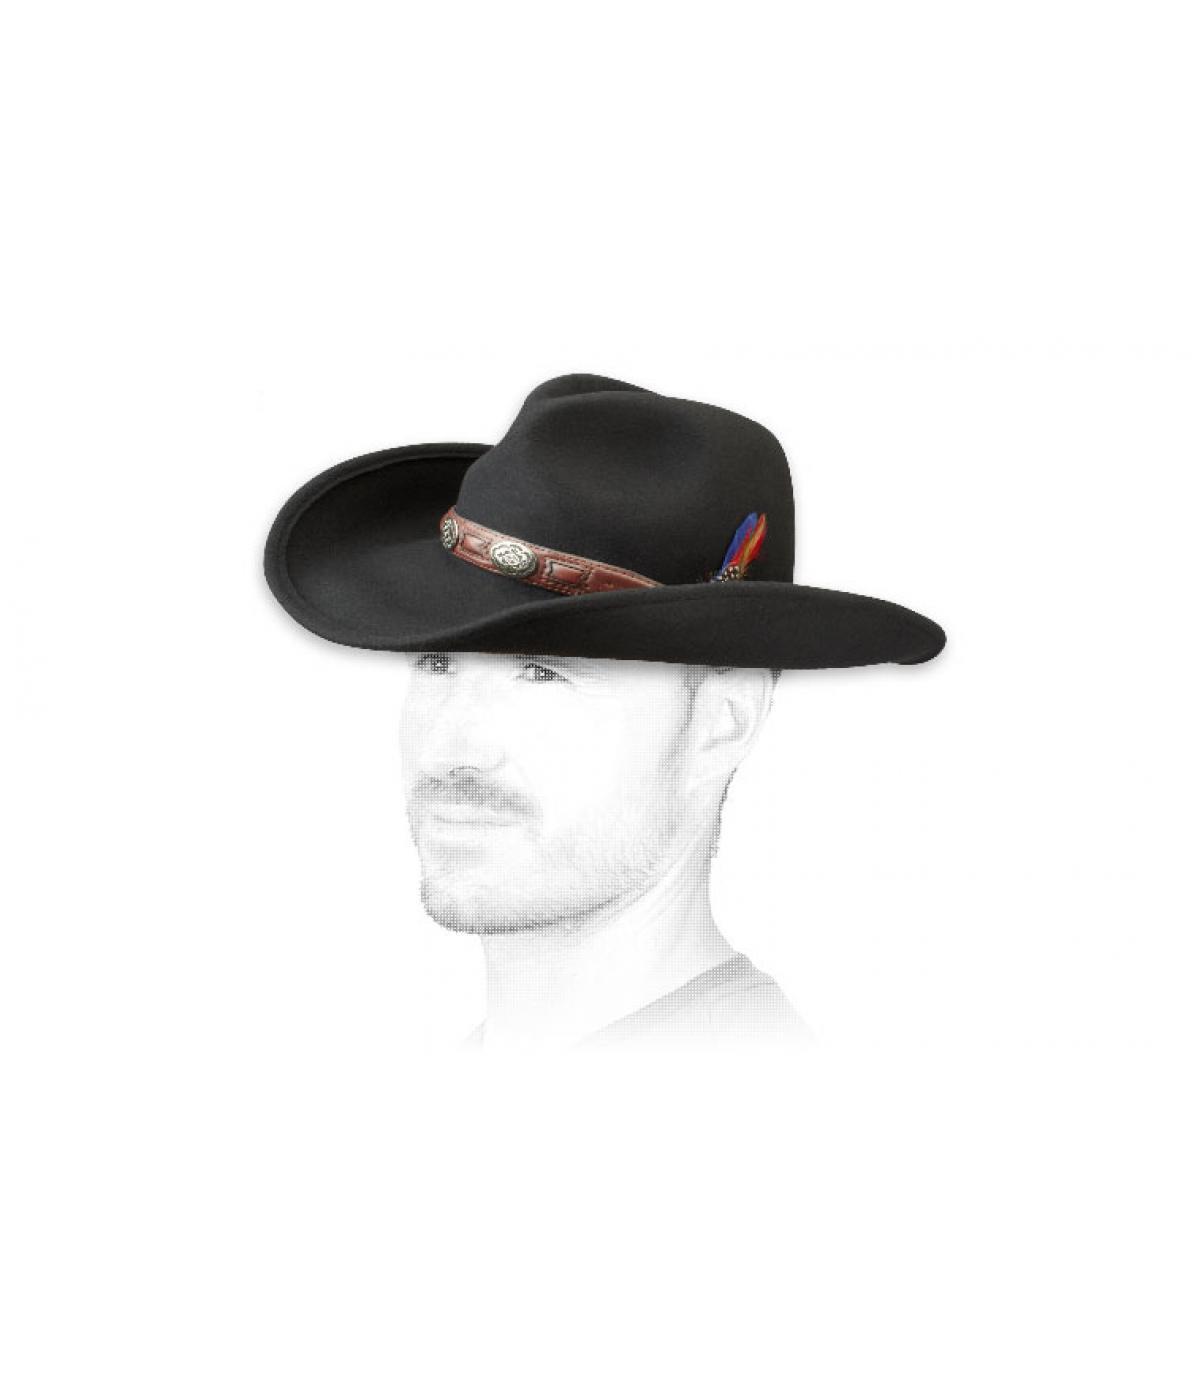 cappello da cowboy stetson